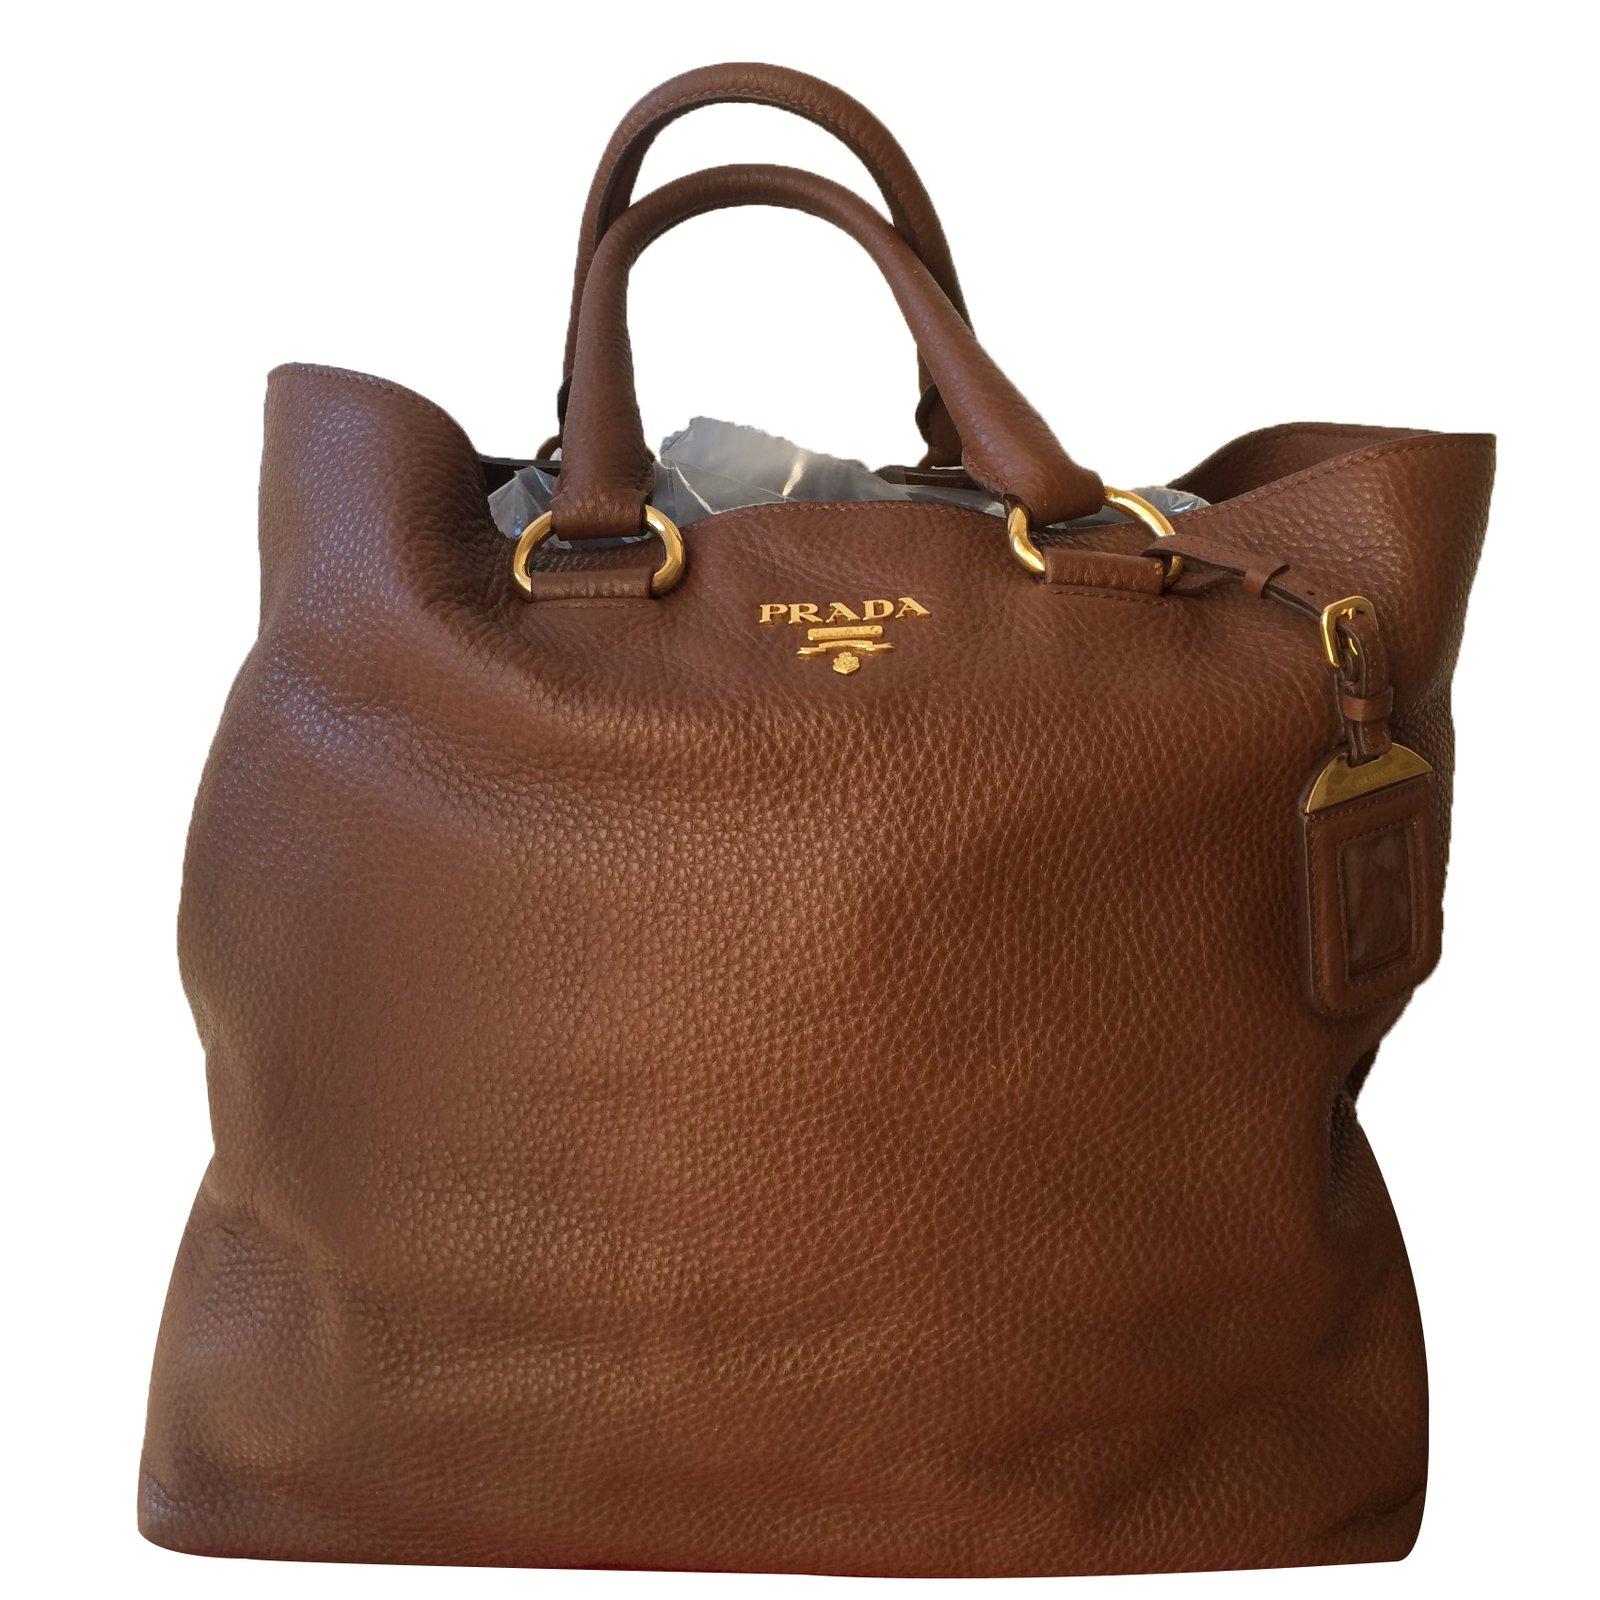 Prada Handbag Handbags Leather Brown Ref 28714 Joli Closet